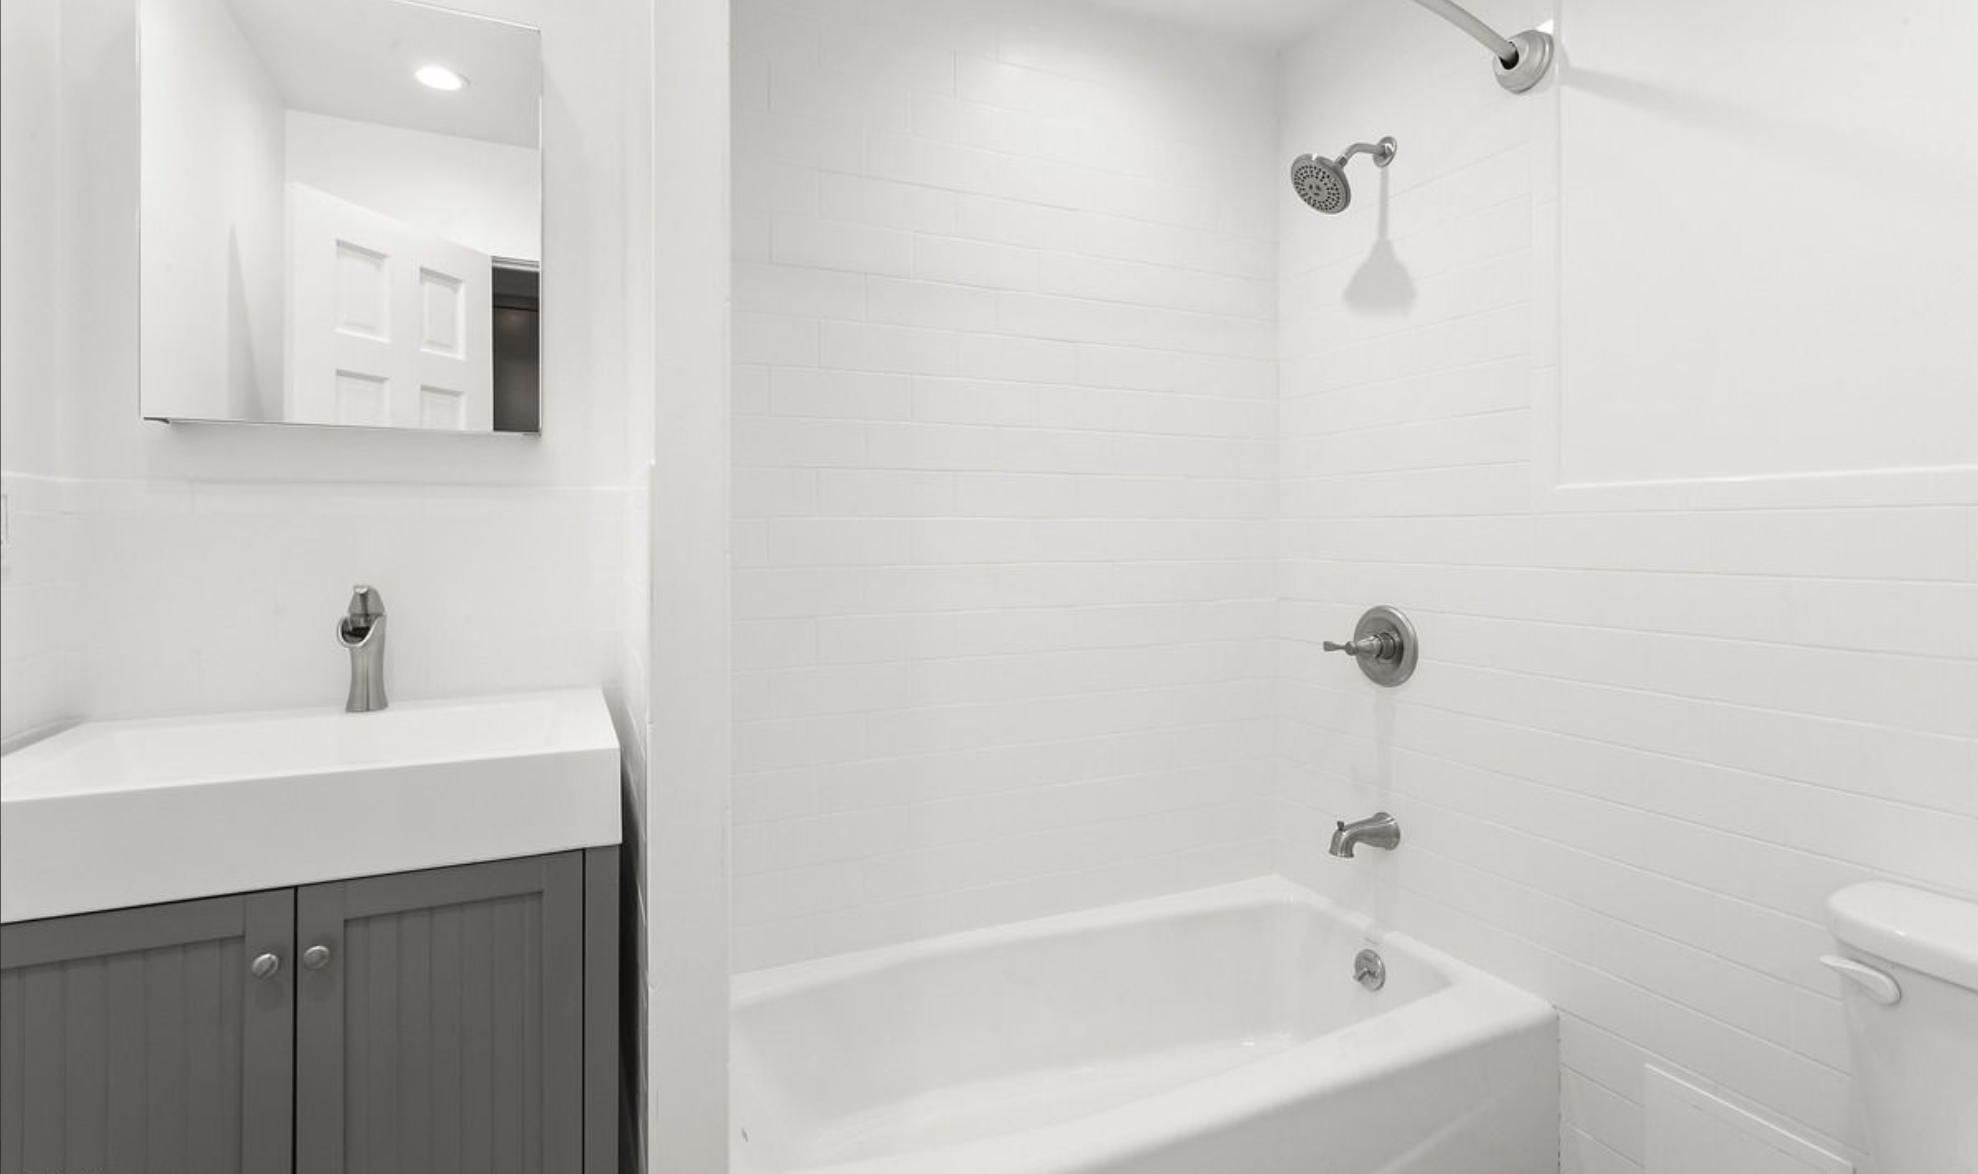 615 Halsey Street Apt. 4 Bathroom.png